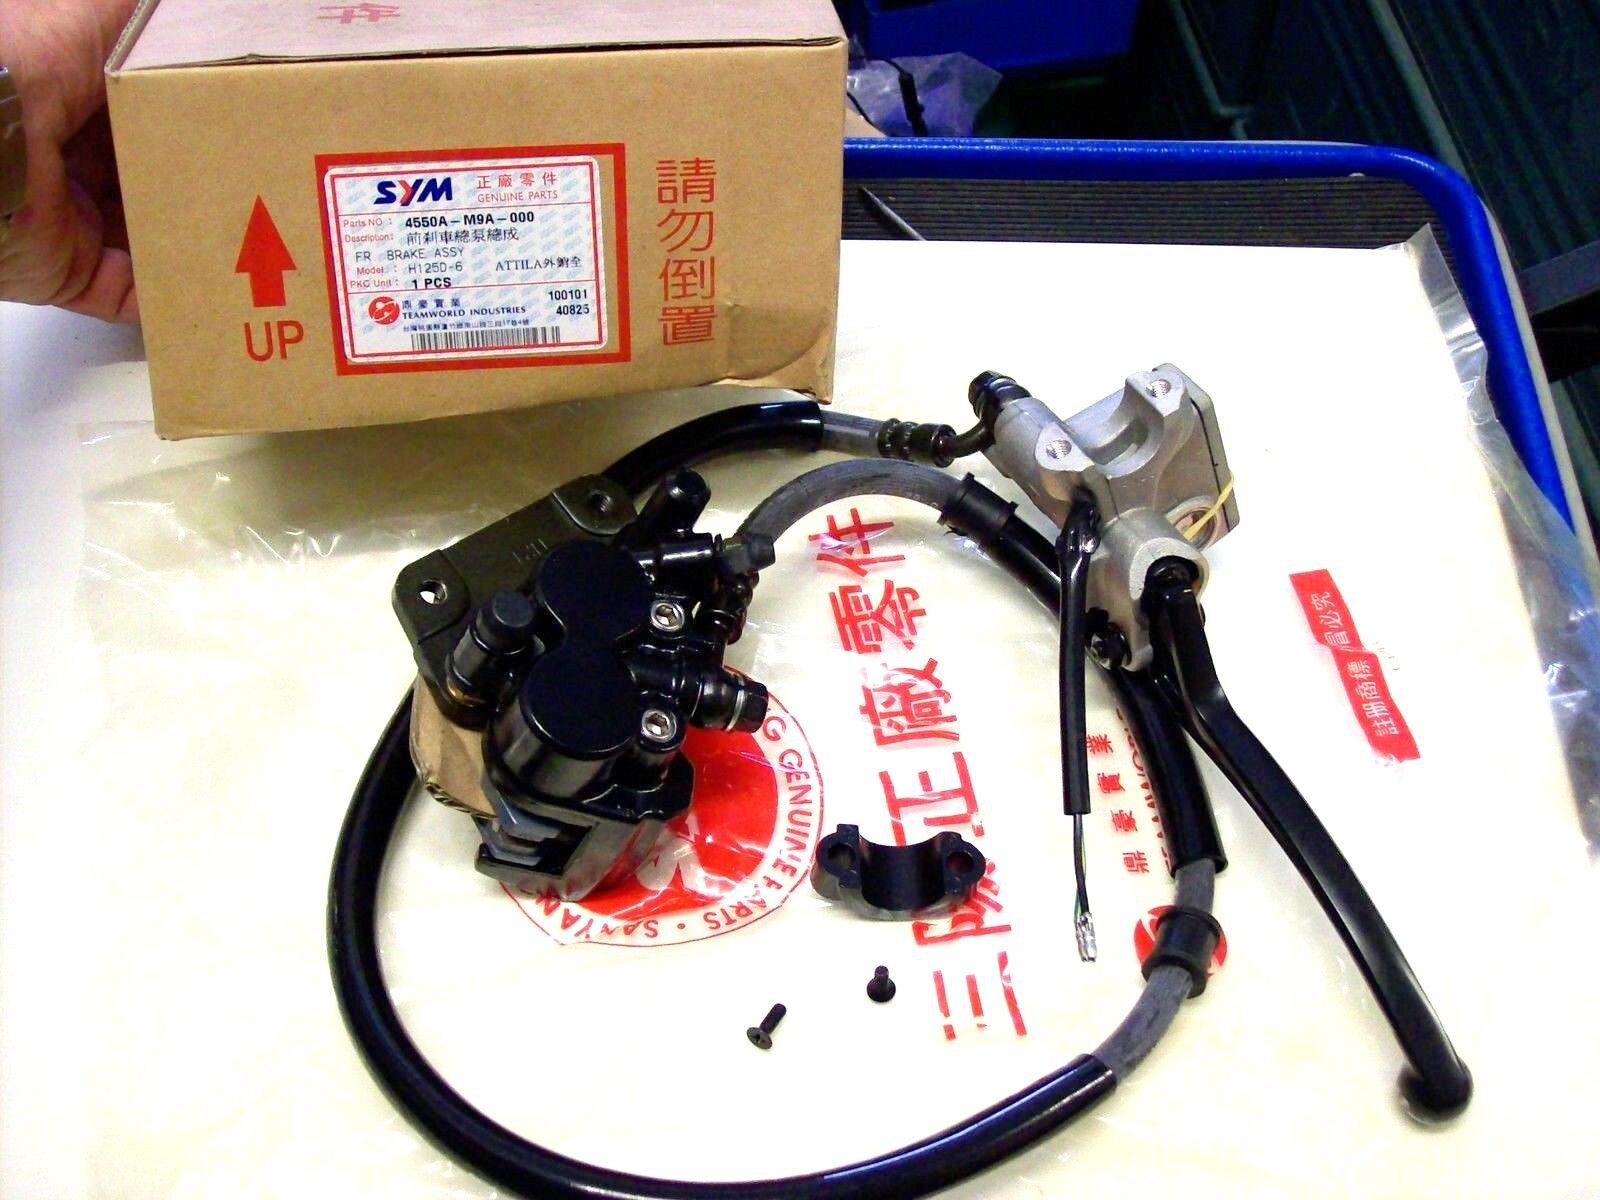 4550A-T31-000 SYM Sanyang Fancy 50 Bremspumpe rechts mit Hebel  ET